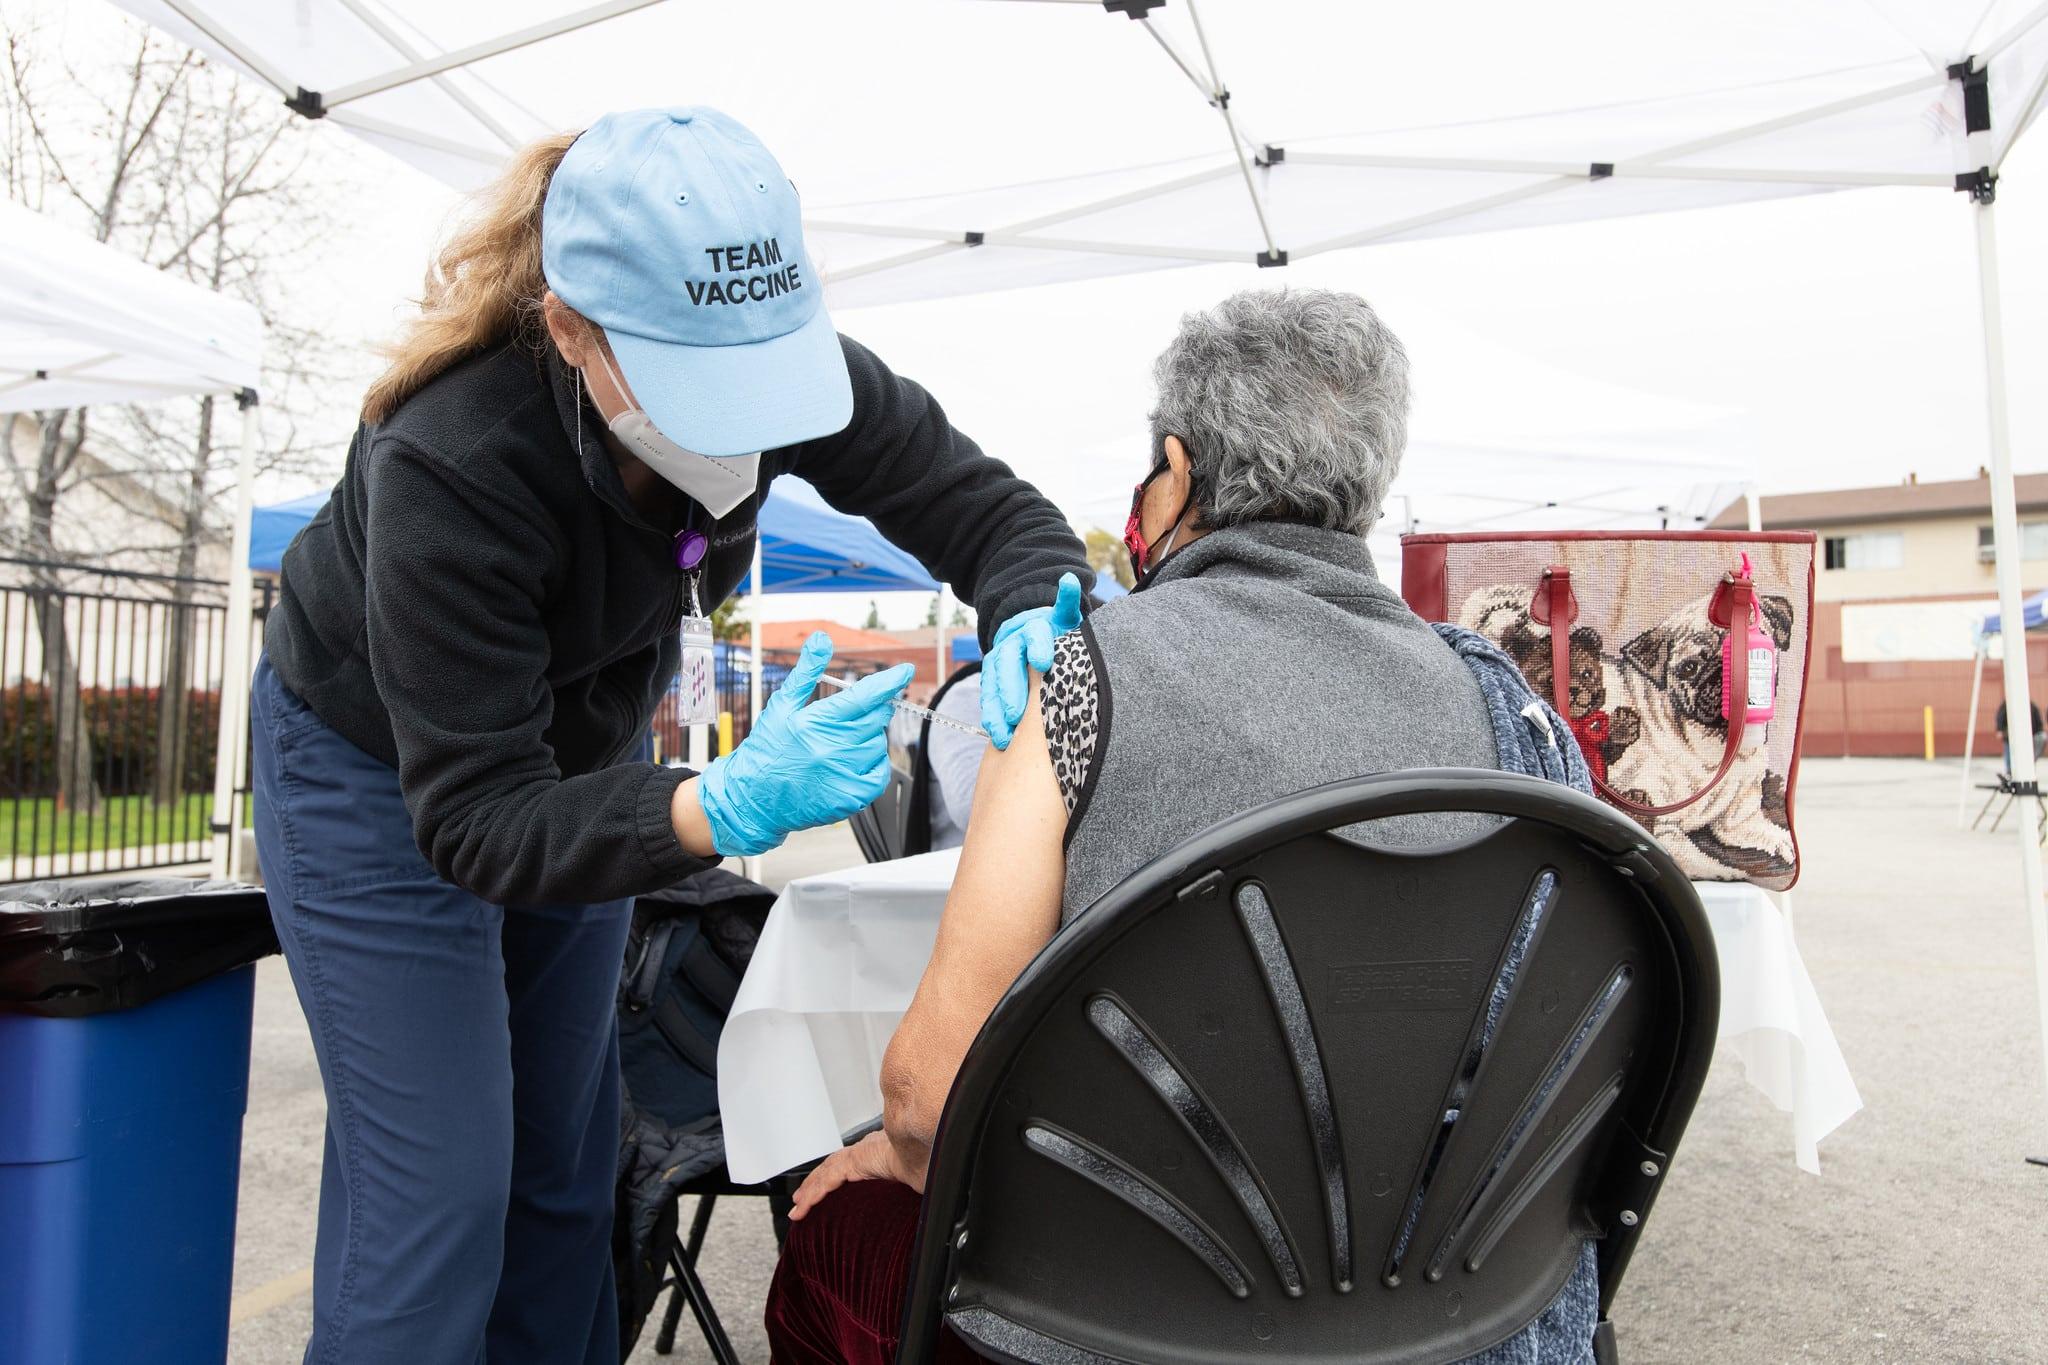 A man received a COVID vaccine